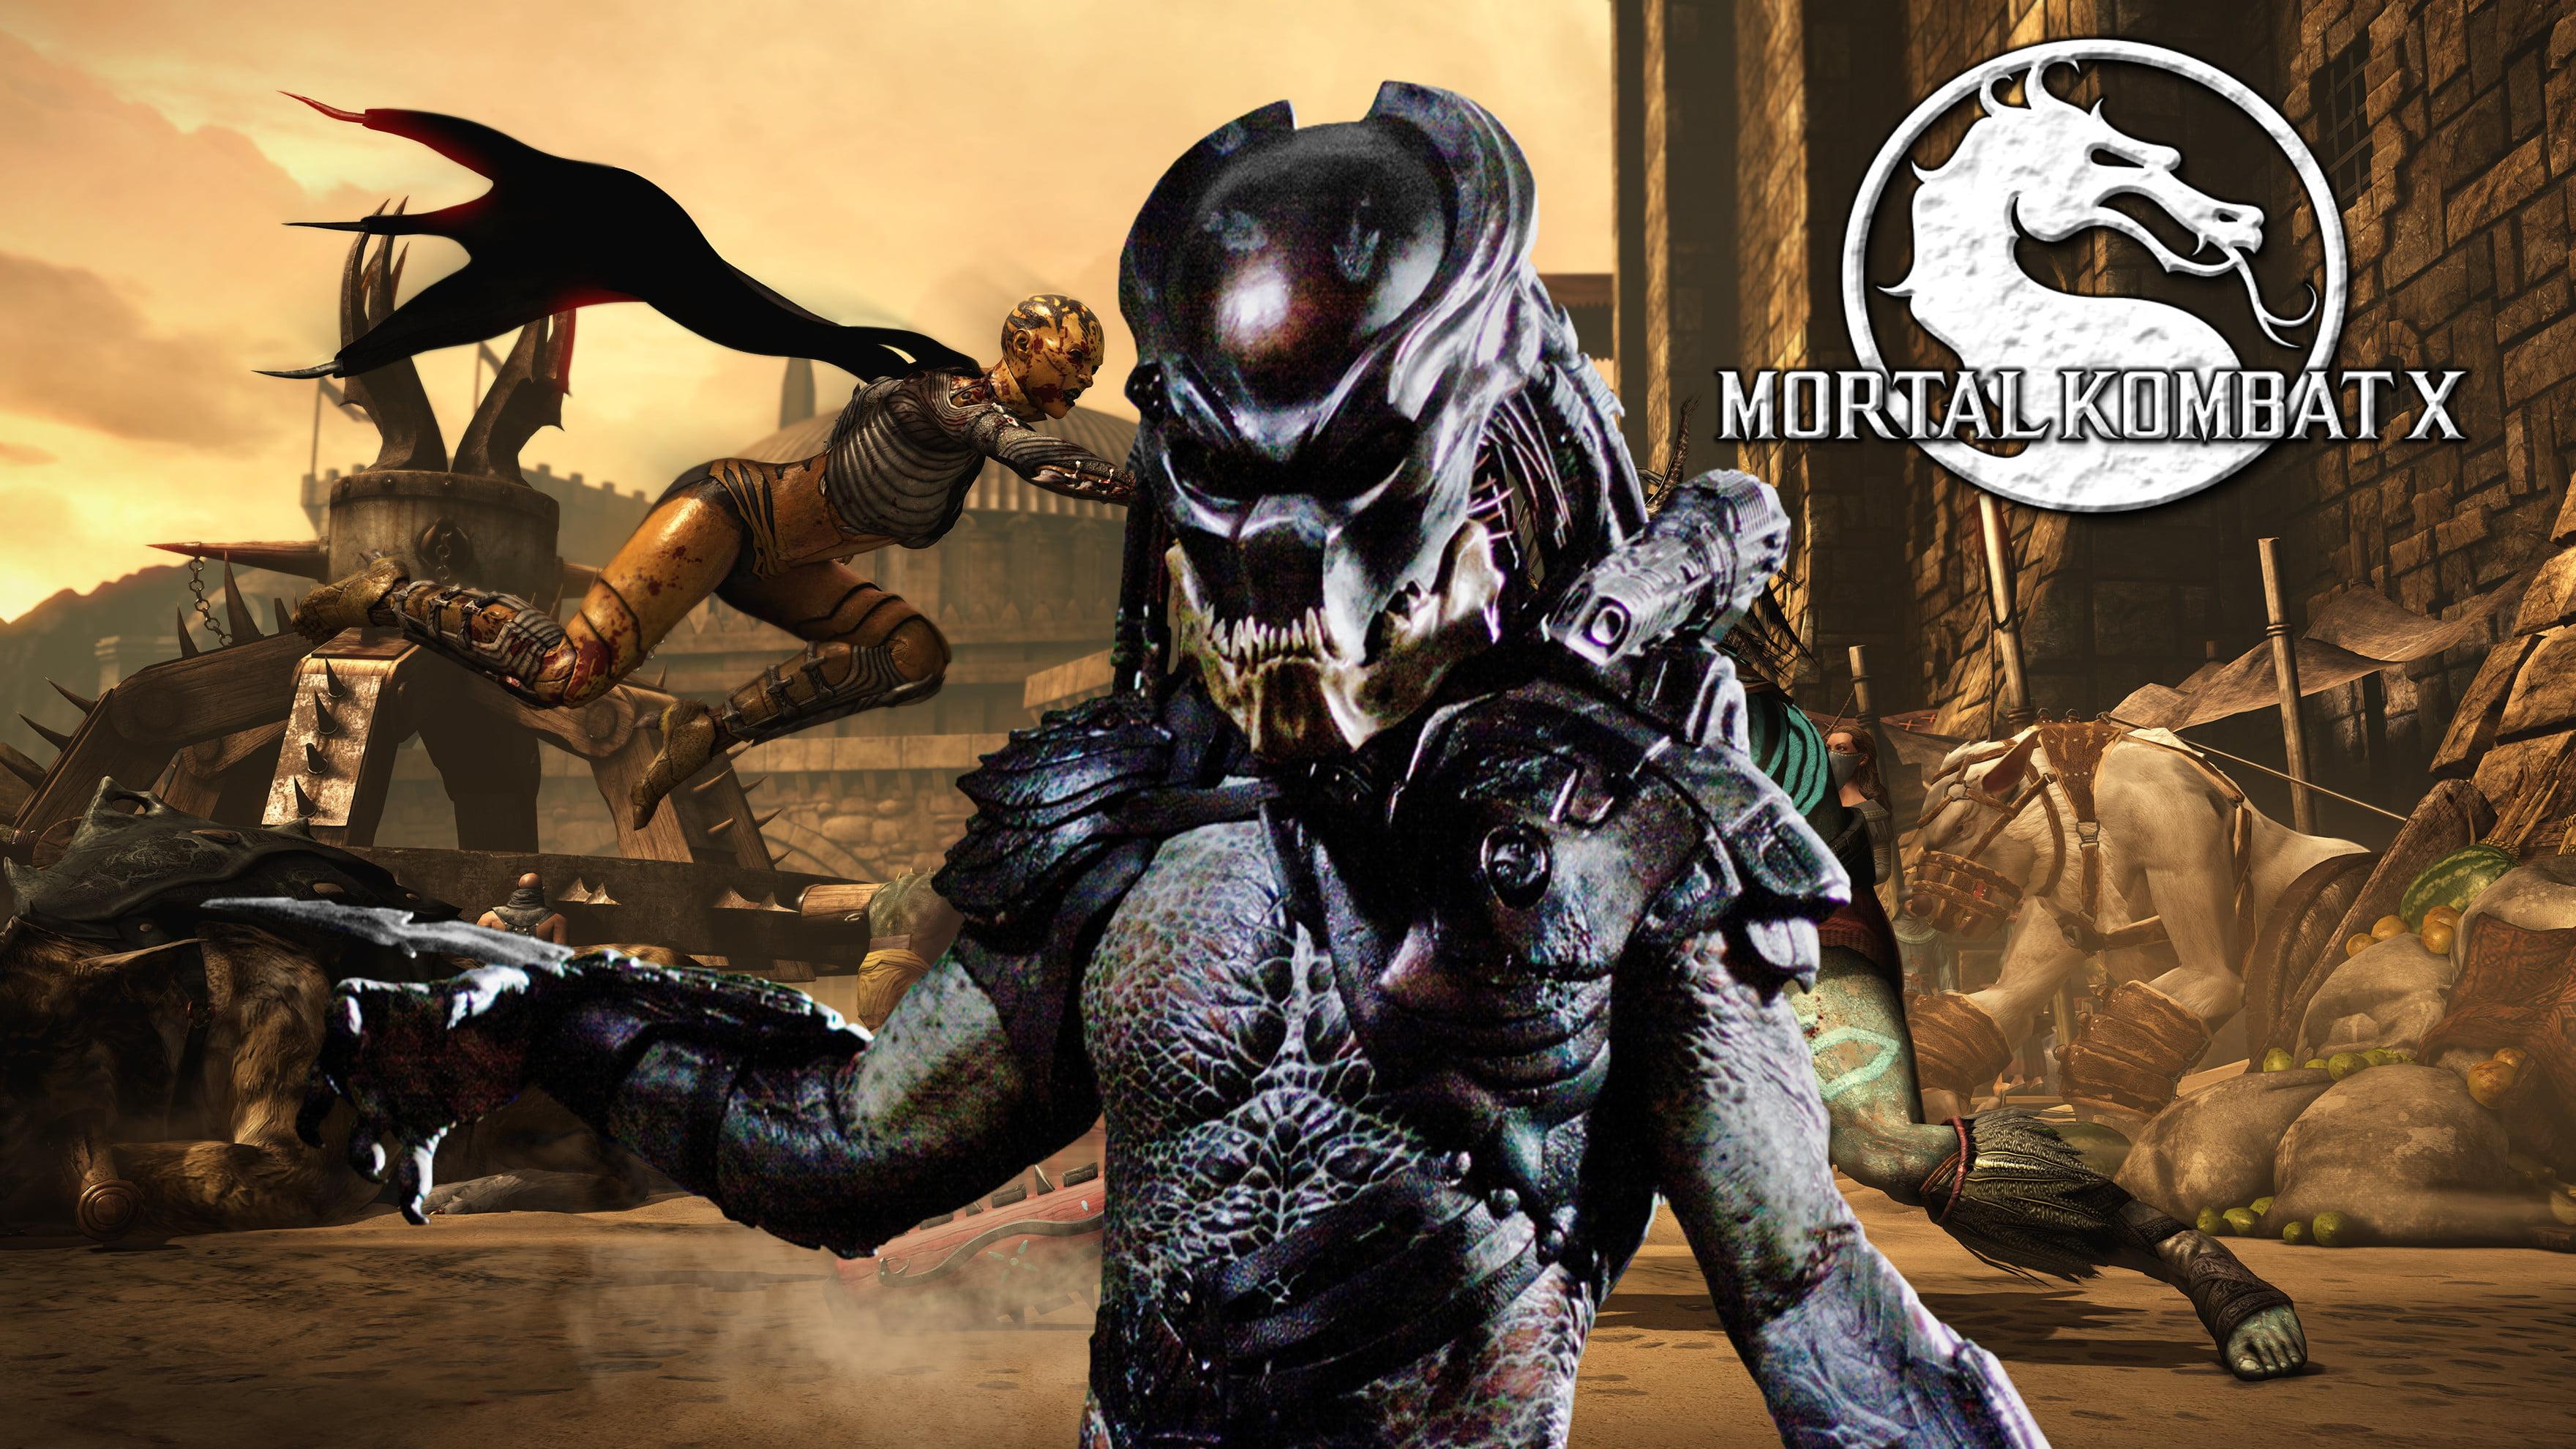 Photo of Predator and Quitalities Coming to Mortal Kombat X